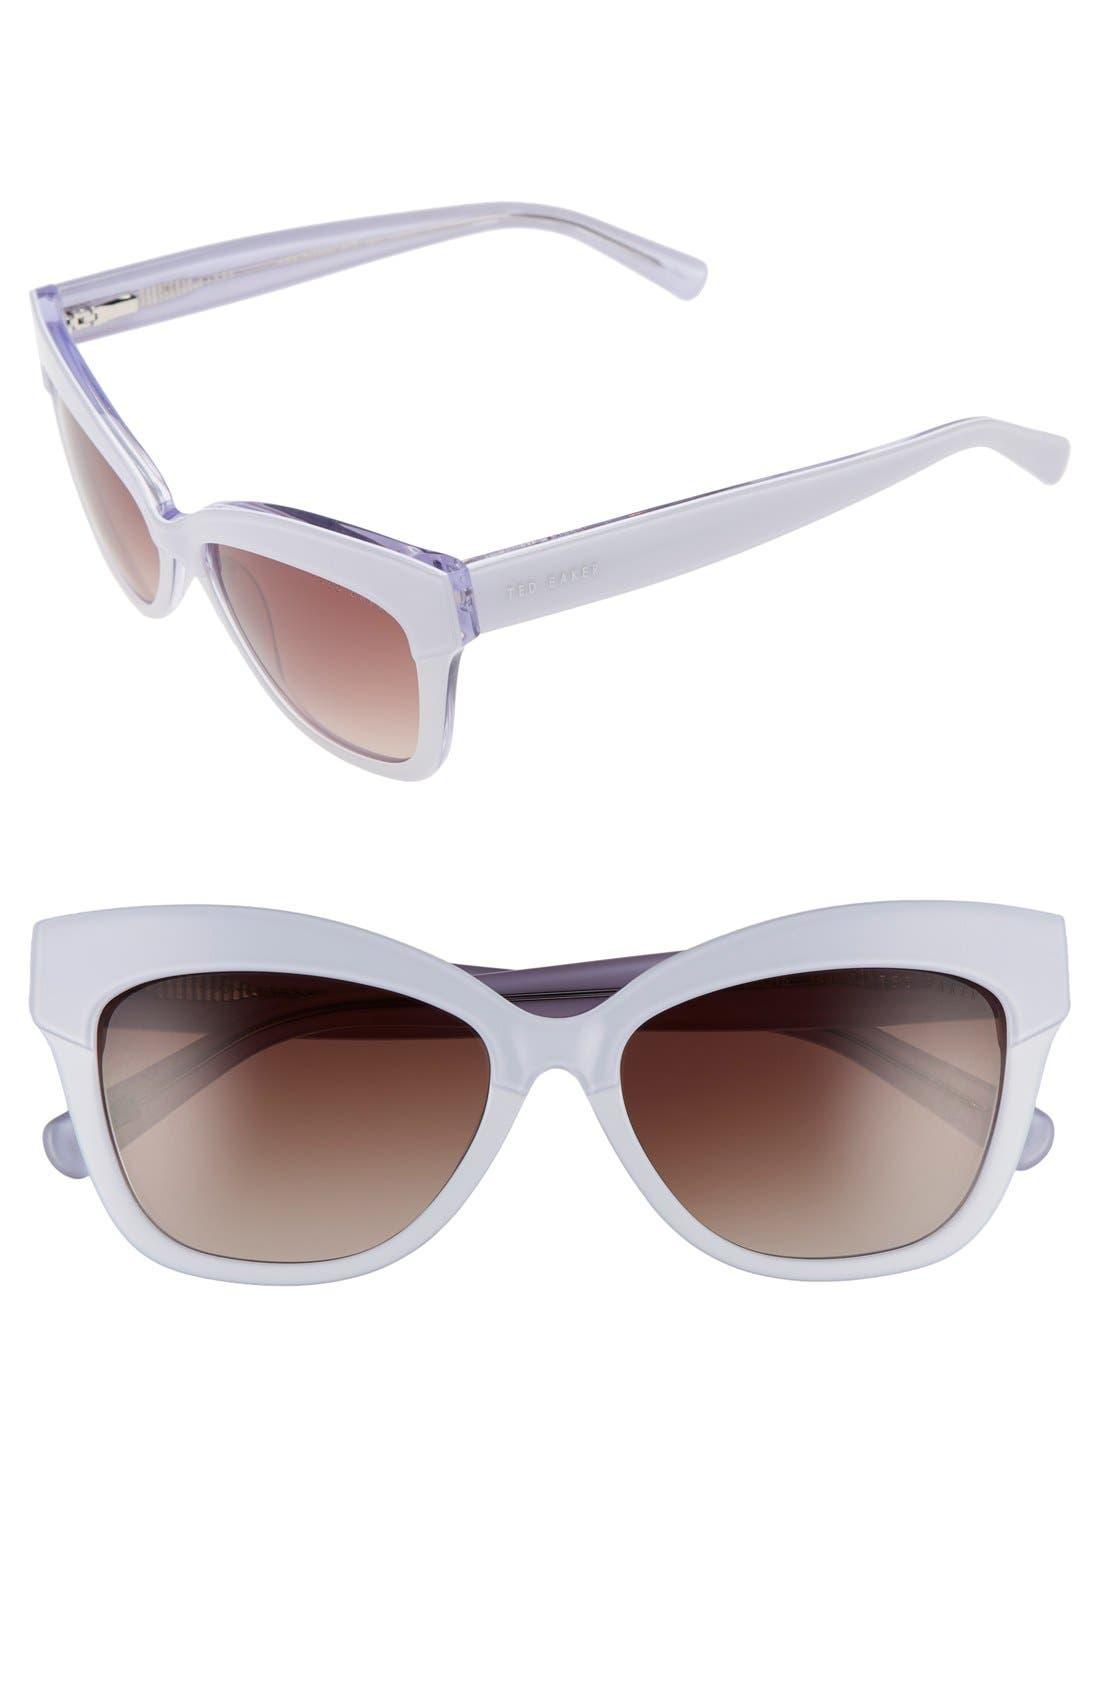 55mm Cat Eye Sunglasses,                         Main,                         color, 100